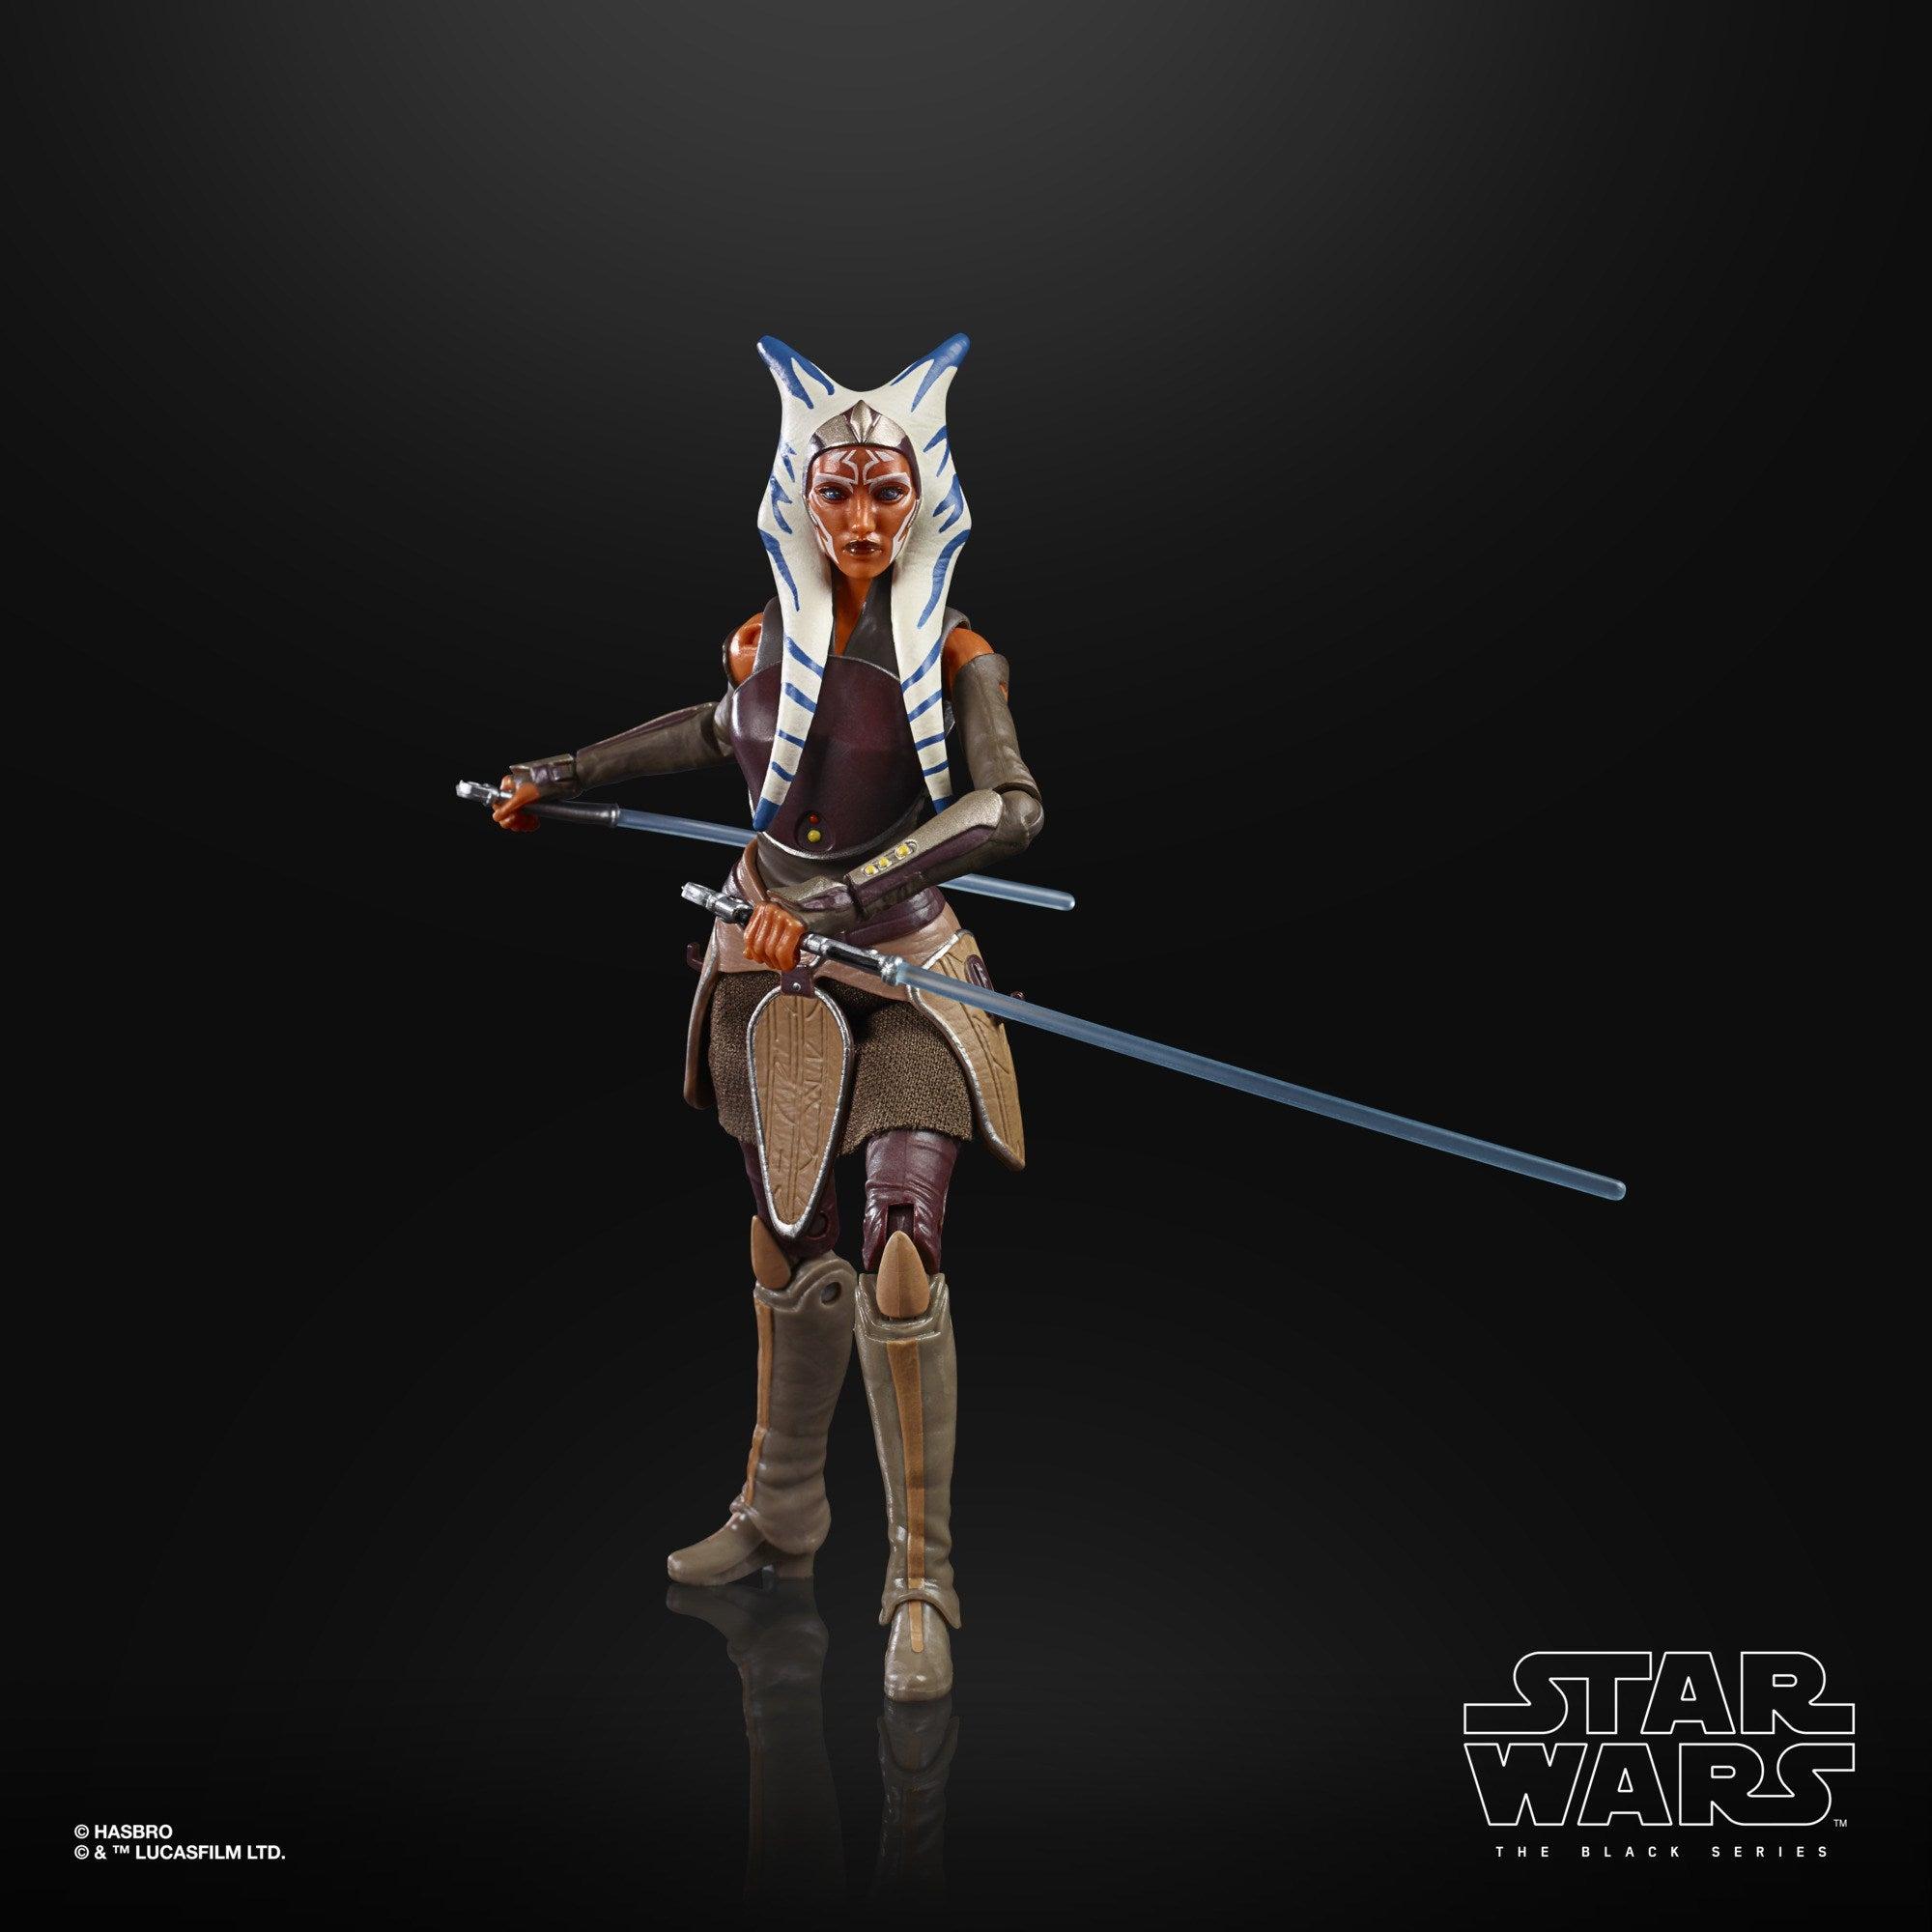 Image of Star Wars The Black Series Rebels Ahsoka Tano 6-Inch Action Figure - SEPTEMBER 2020